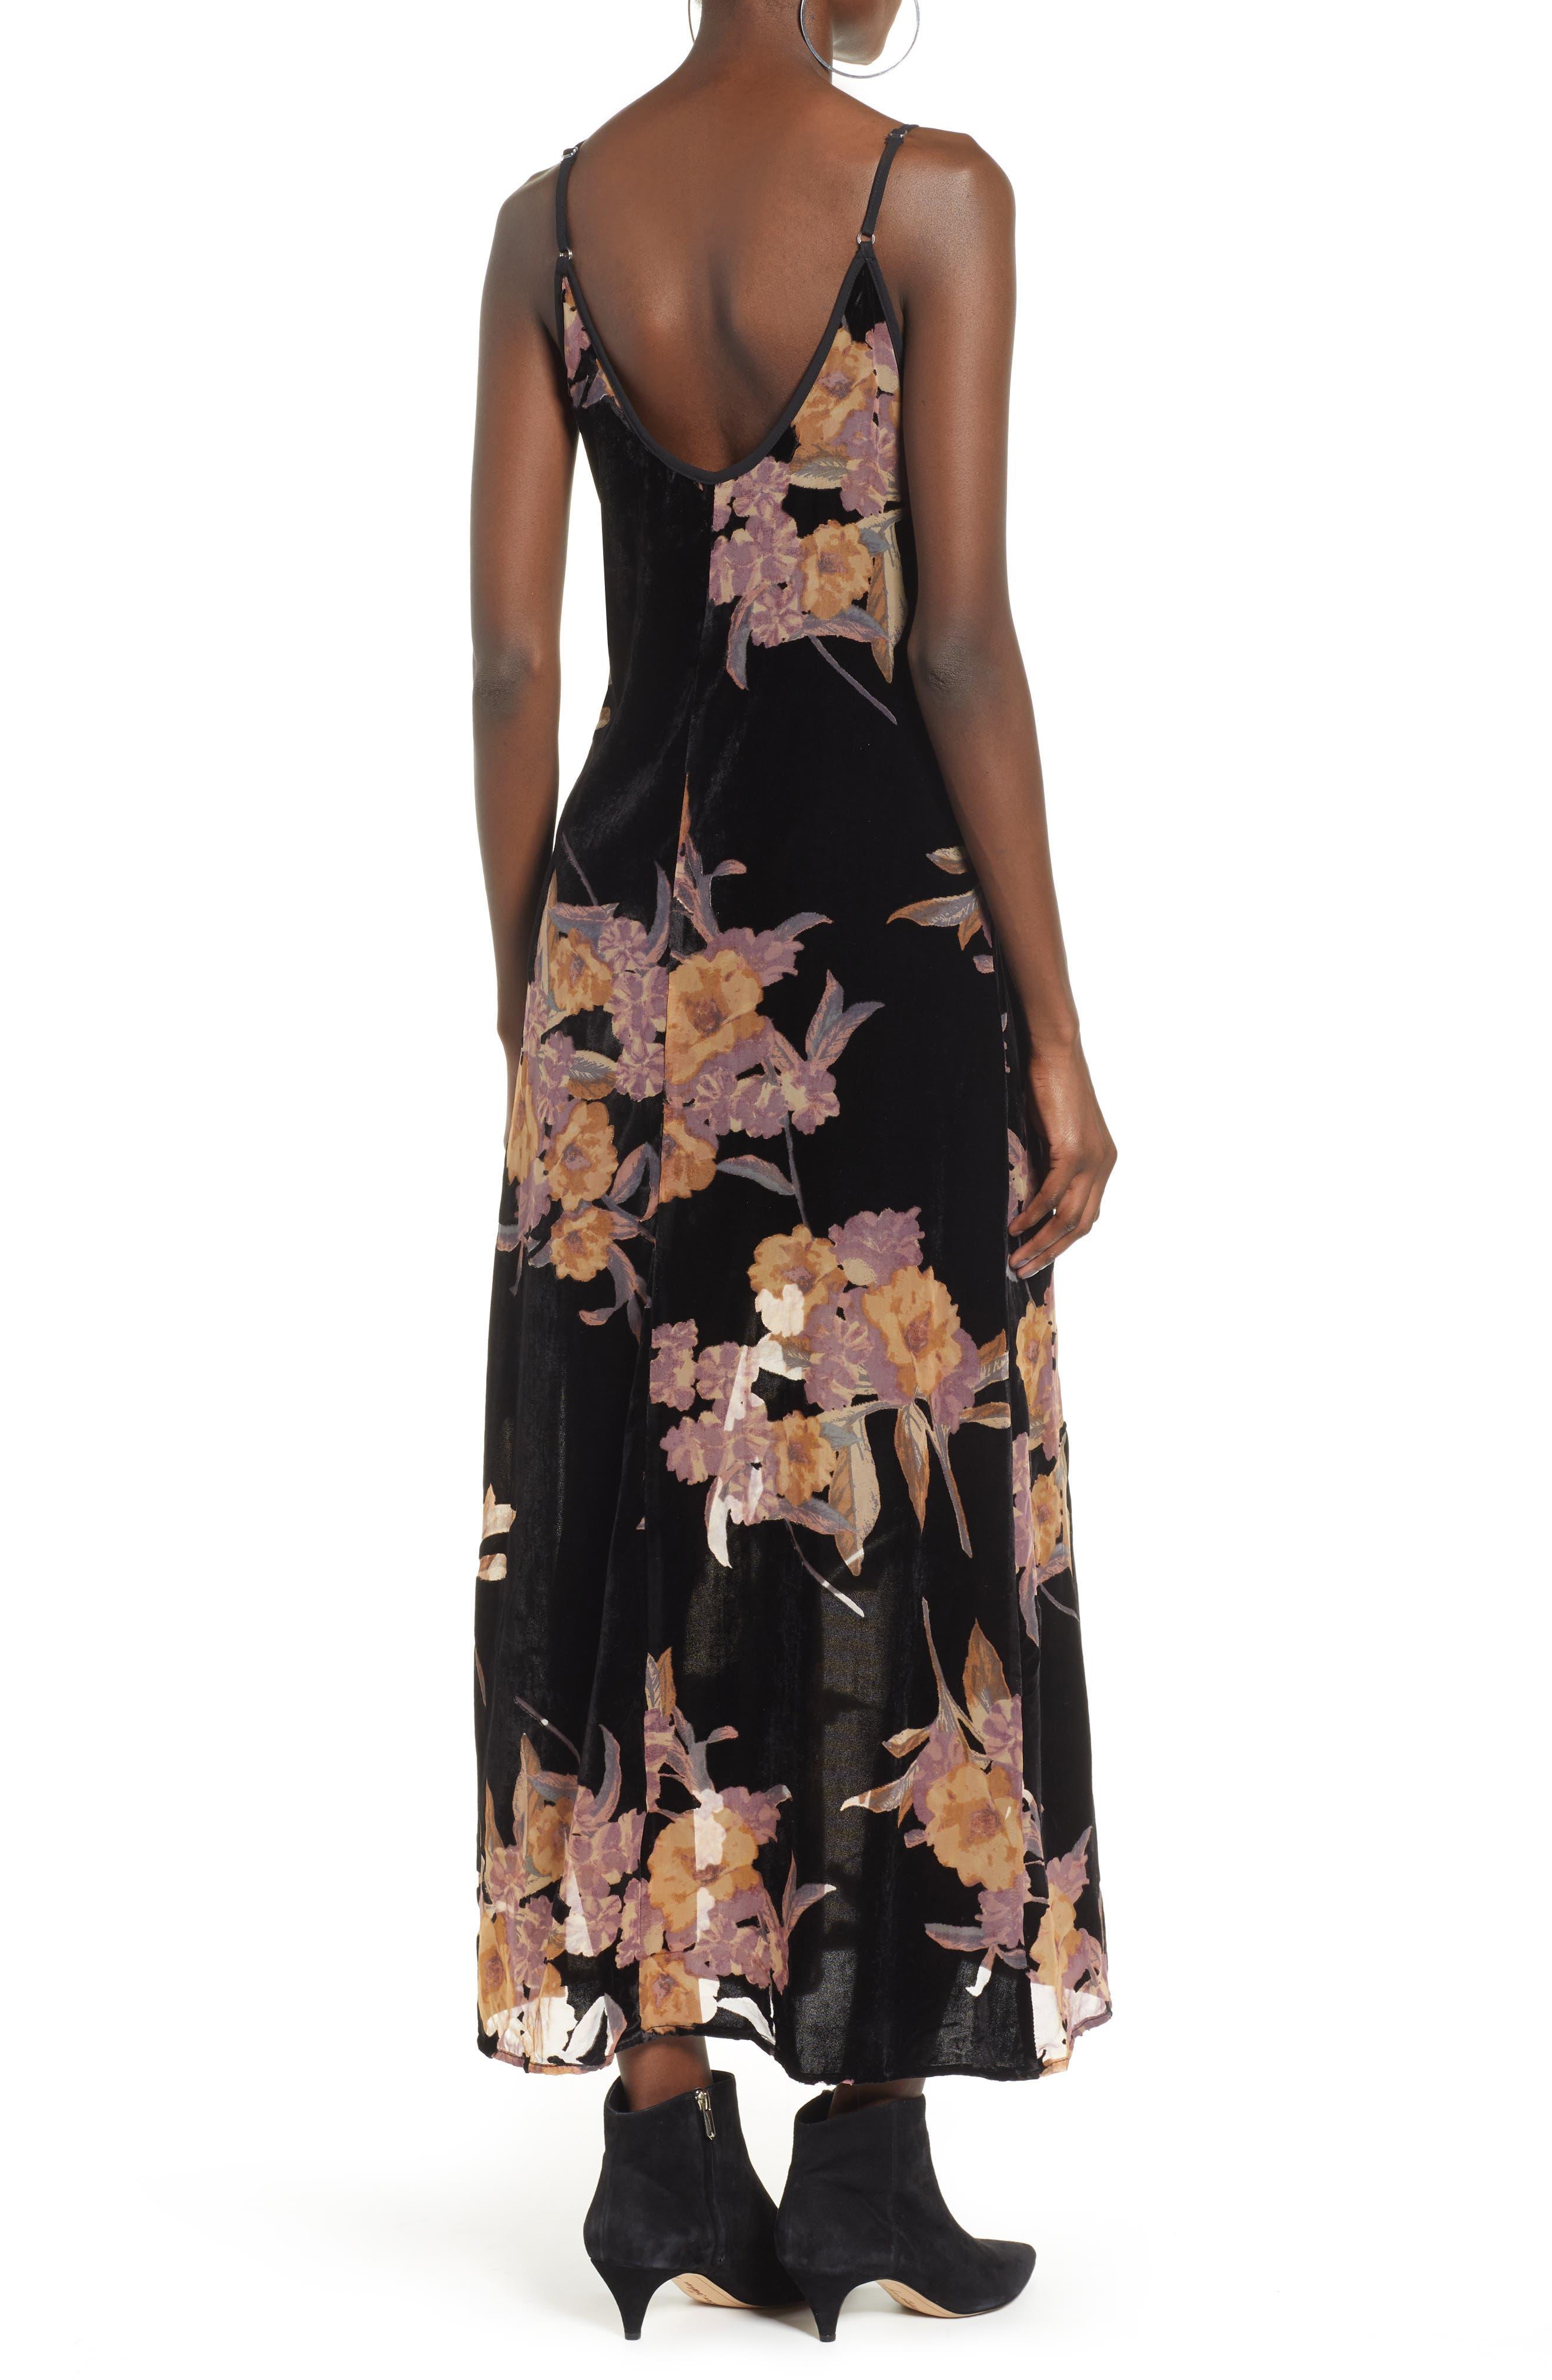 BAND OF GYPSIES,                             Mallorey Floral Print Velvet Dress,                             Alternate thumbnail 2, color,                             001